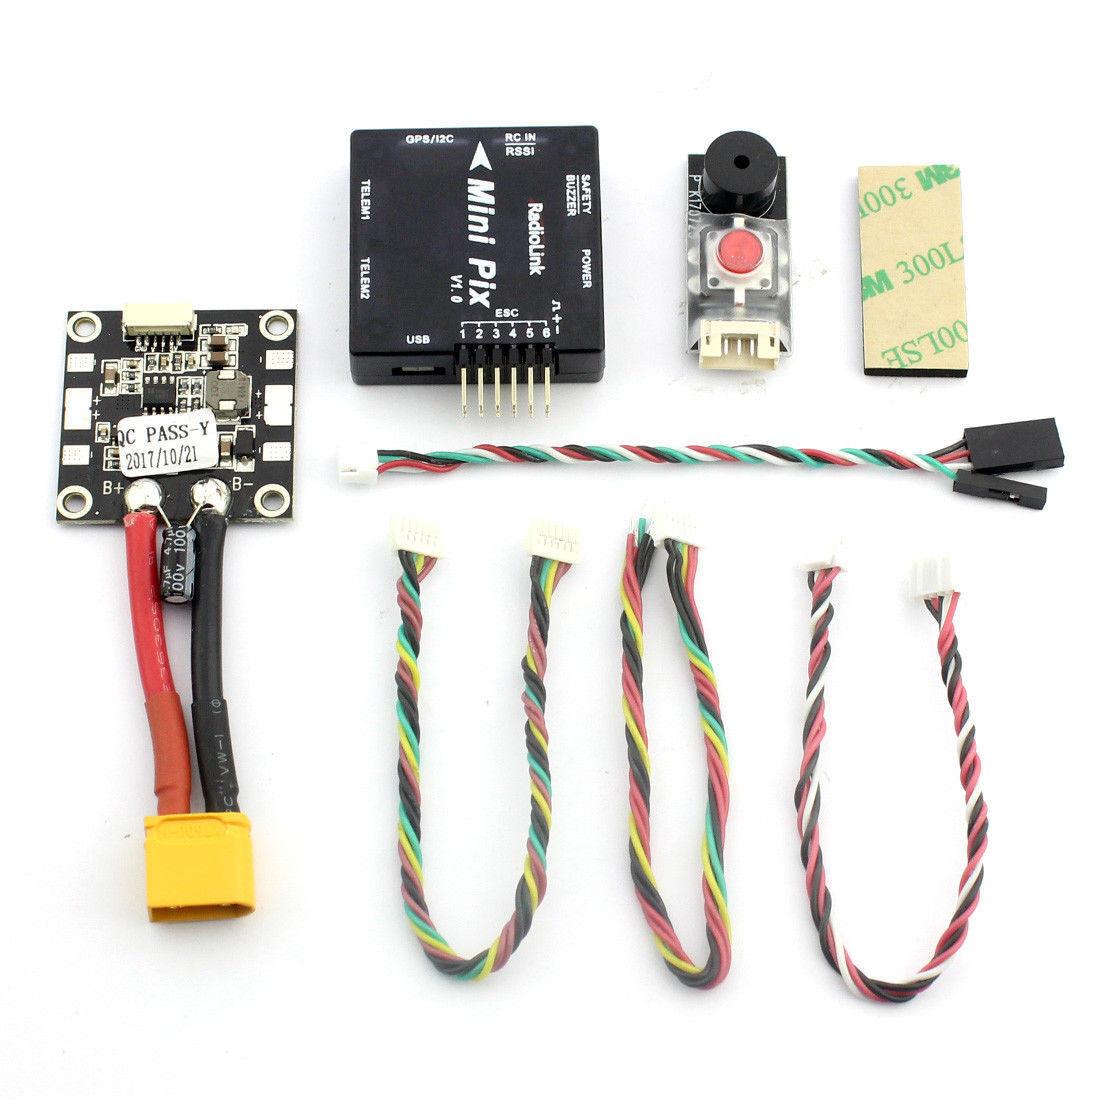 Radiolink Mini PIX Flight Control Basic Configuration without GPS Model Pre-sale